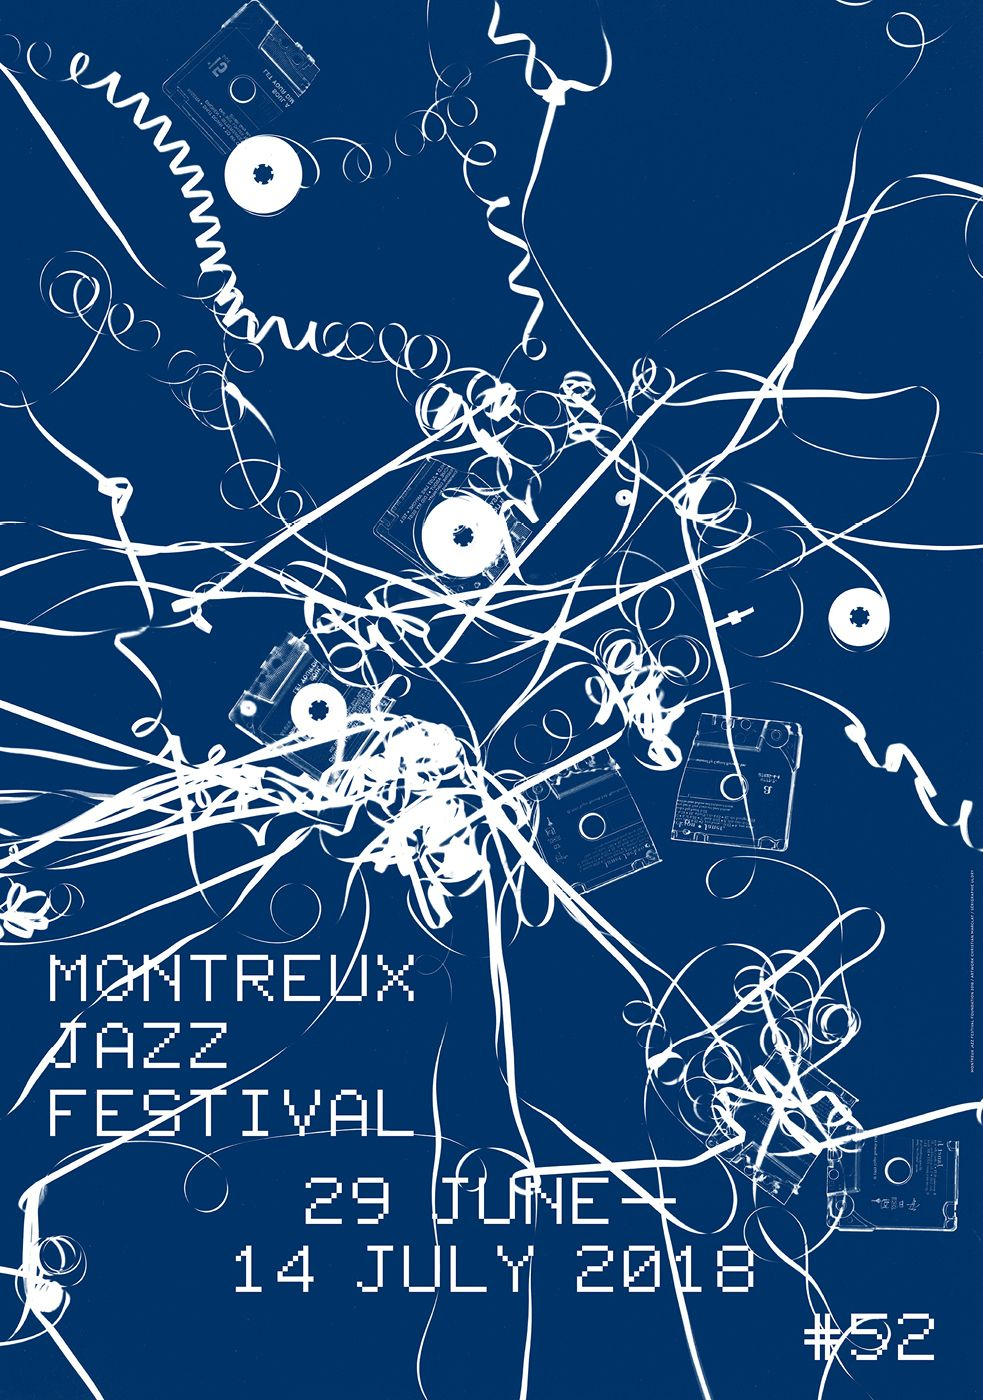 © Montreux Jazz Festival 2018 / Artwork Christian Marclay / Design Laurent Benner